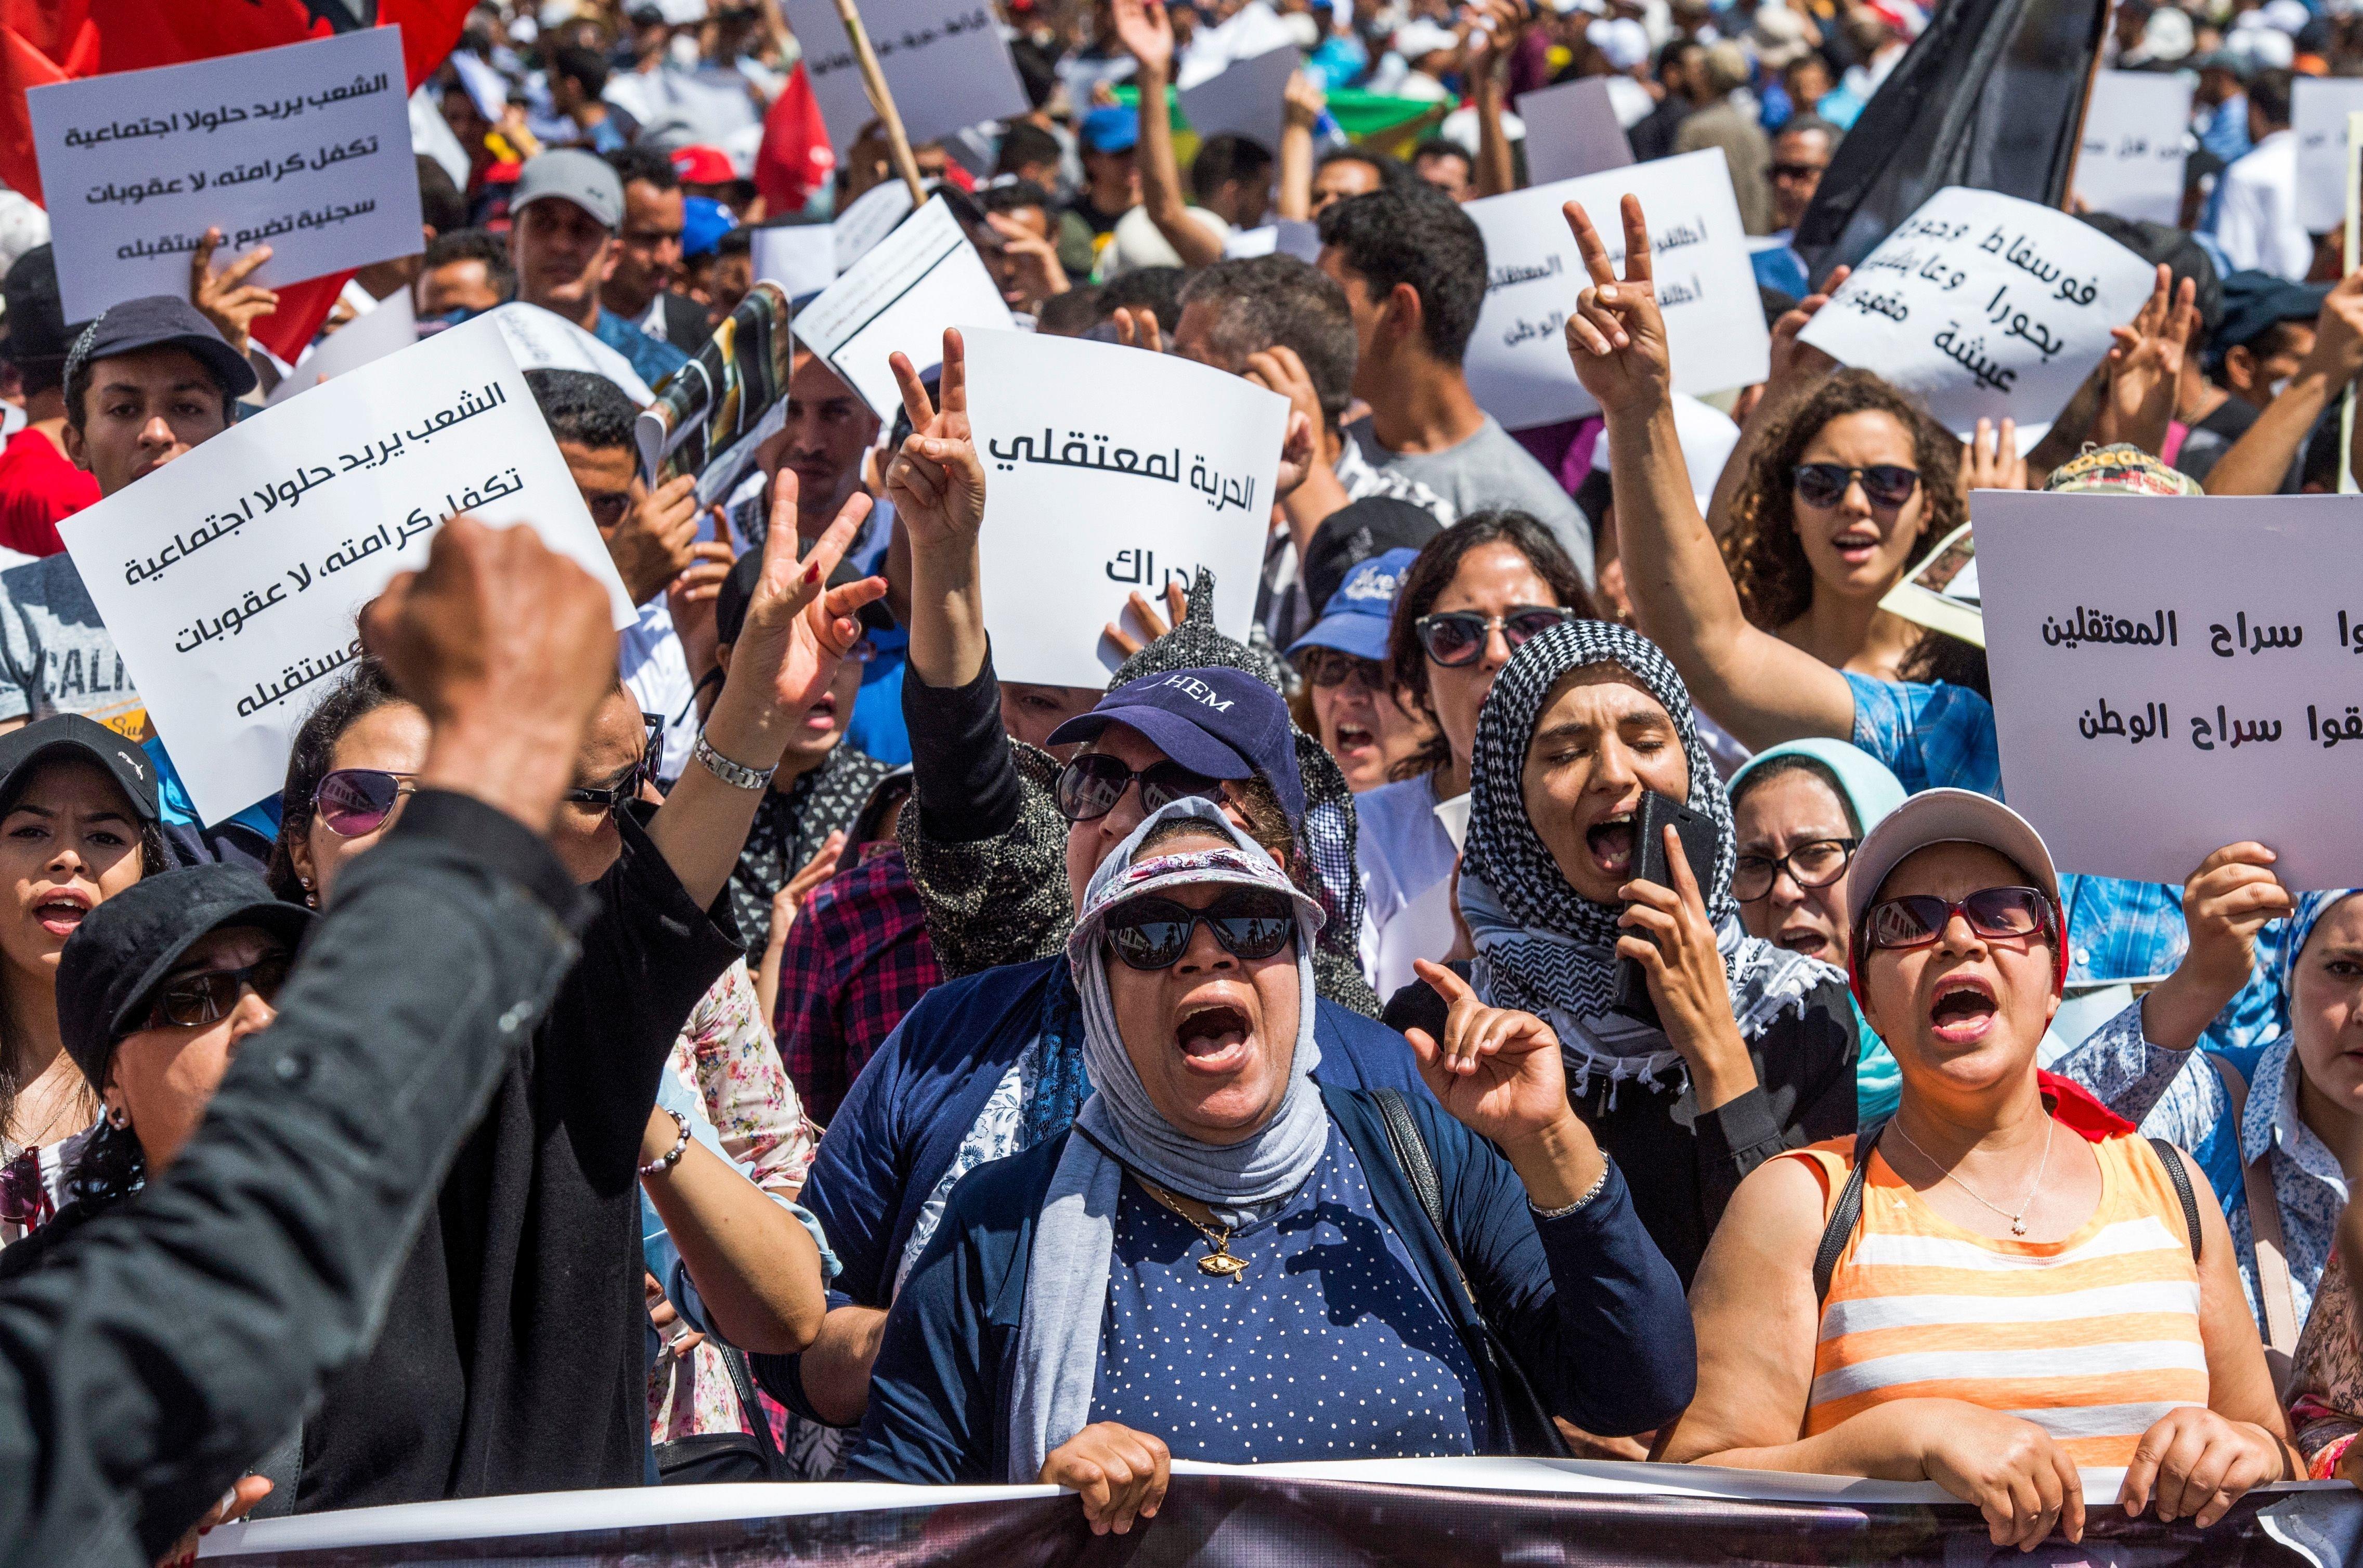 Détenus du Hirak: Nasser Zefzafi et Mohamed Haki auraient